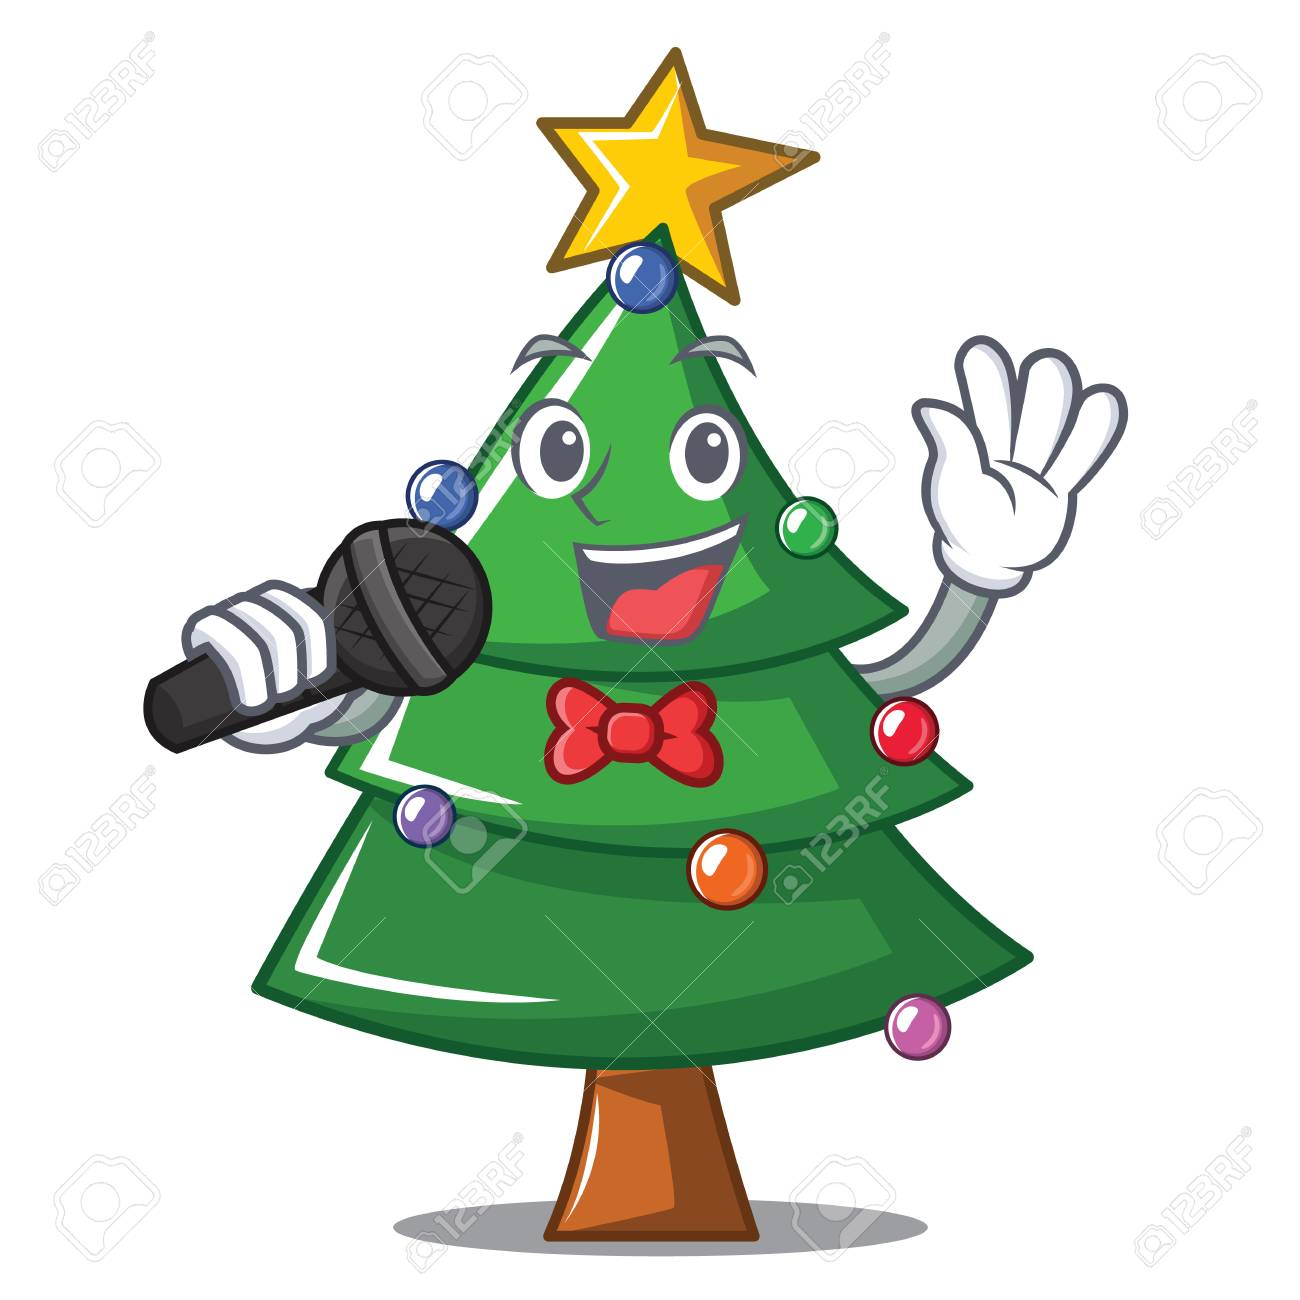 Singing Christmas tree character cartoon vector illustration.